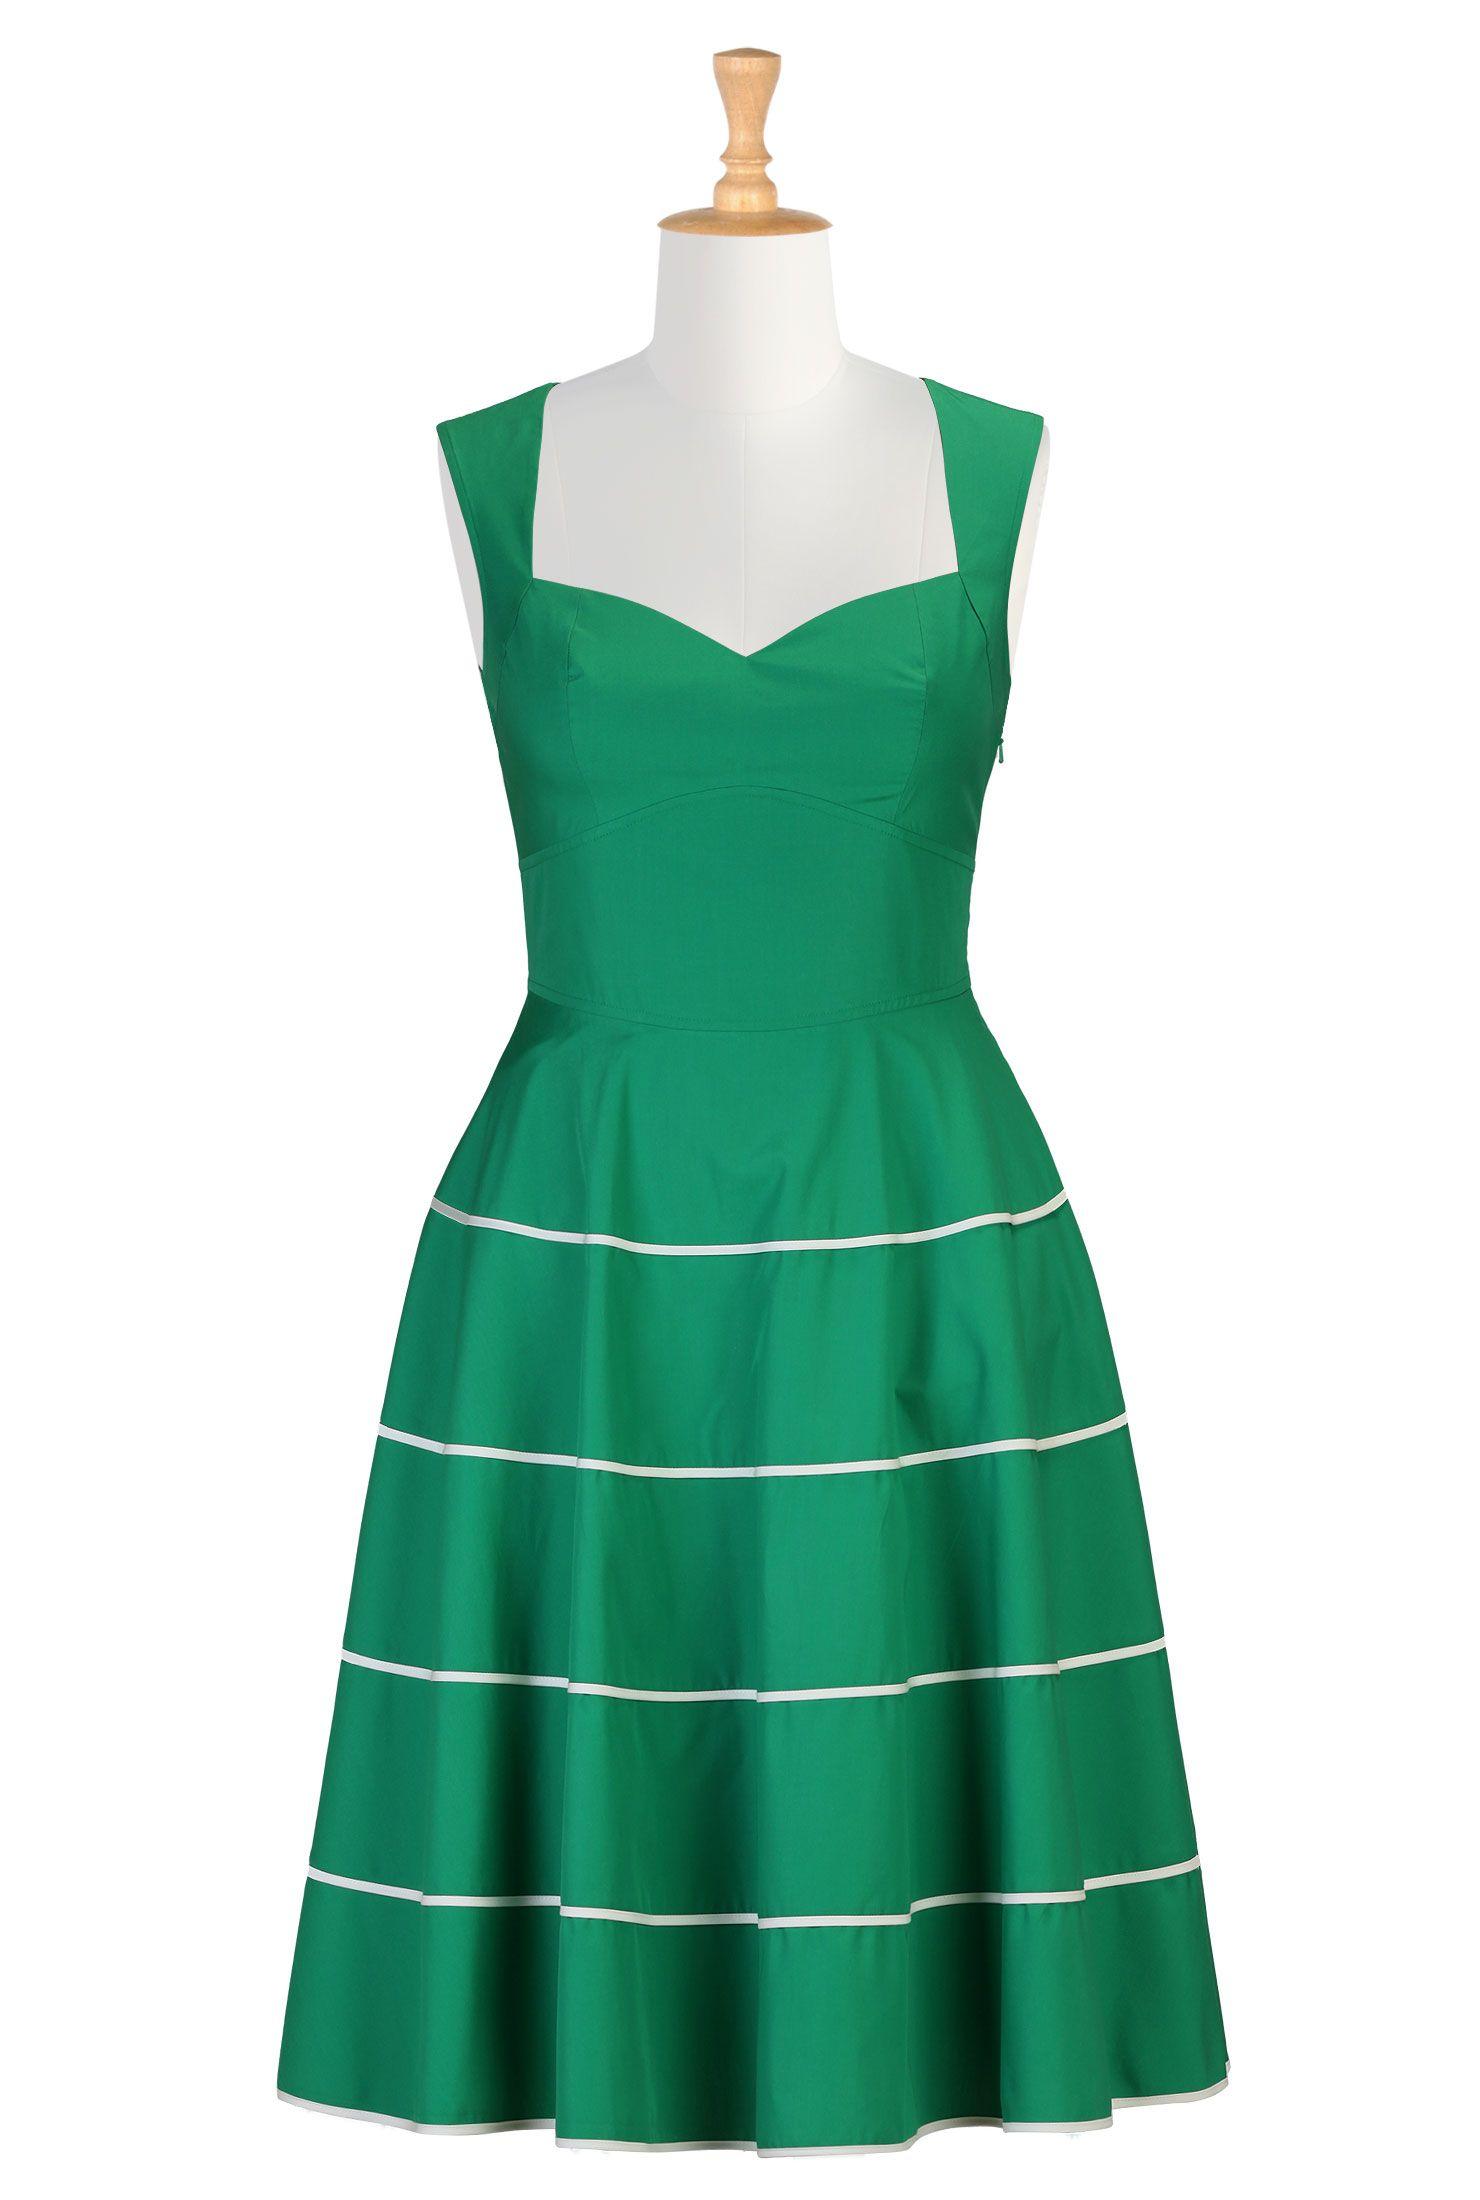 Her fifties tipped trim dress | Summer dresses, Dresses dresses and ...